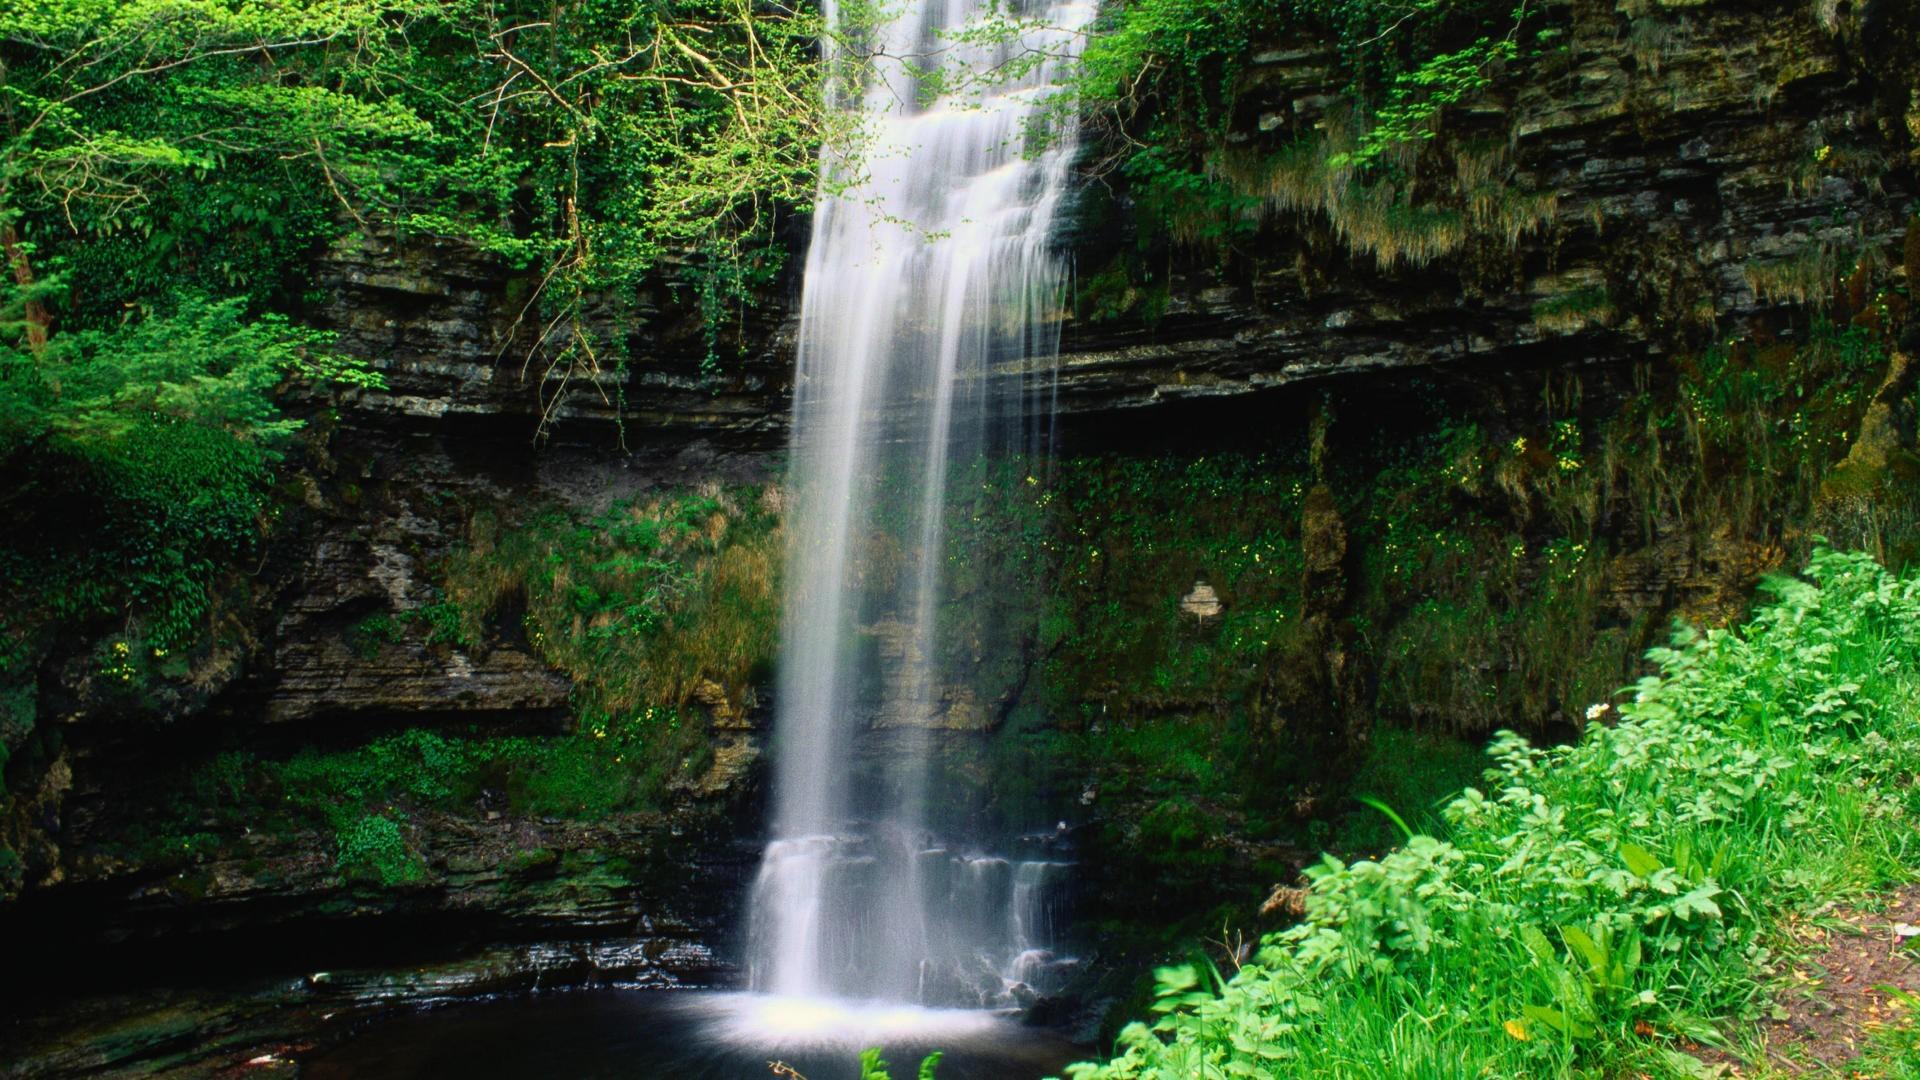 Glencar waterfall Ireland wallpaper   418684 1920x1080